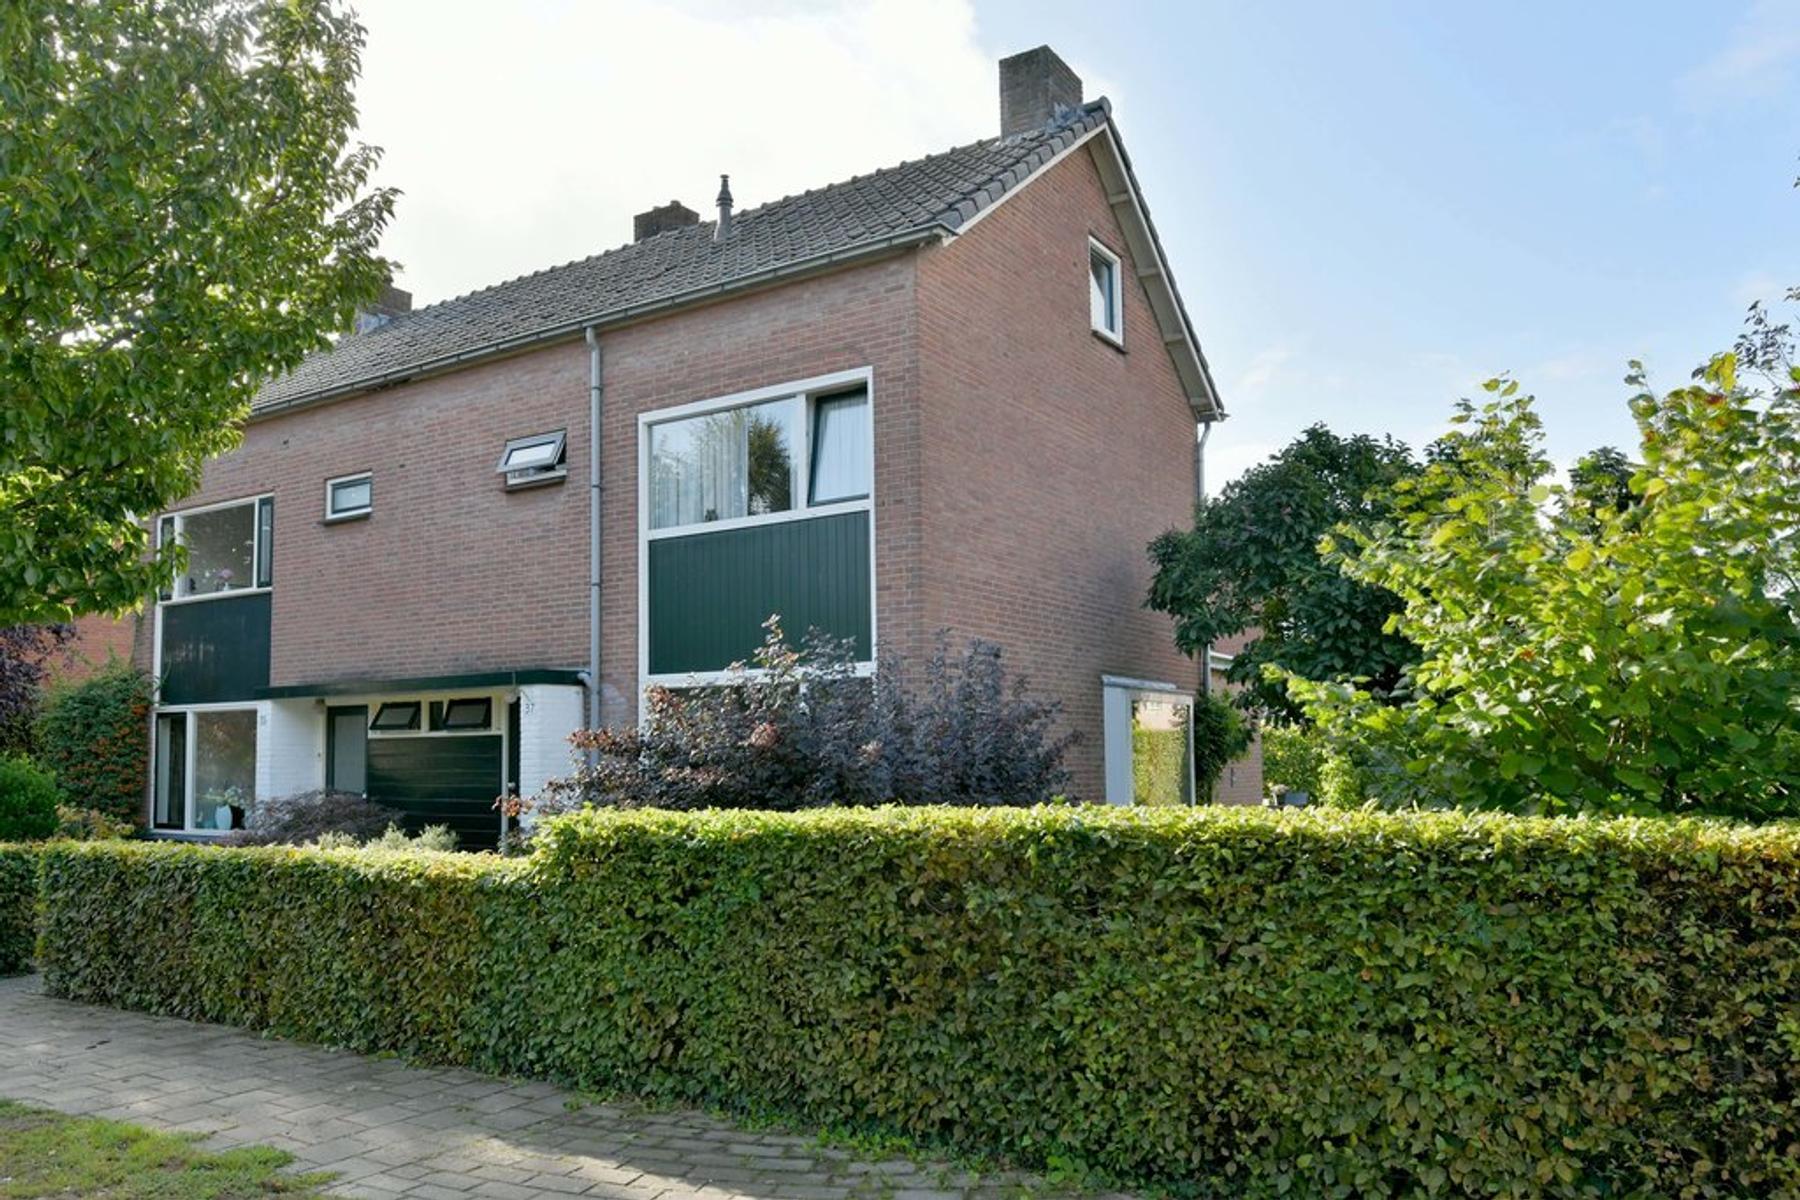 Goeman Borgesiusstraat 37 in Brummen 6971 DJ